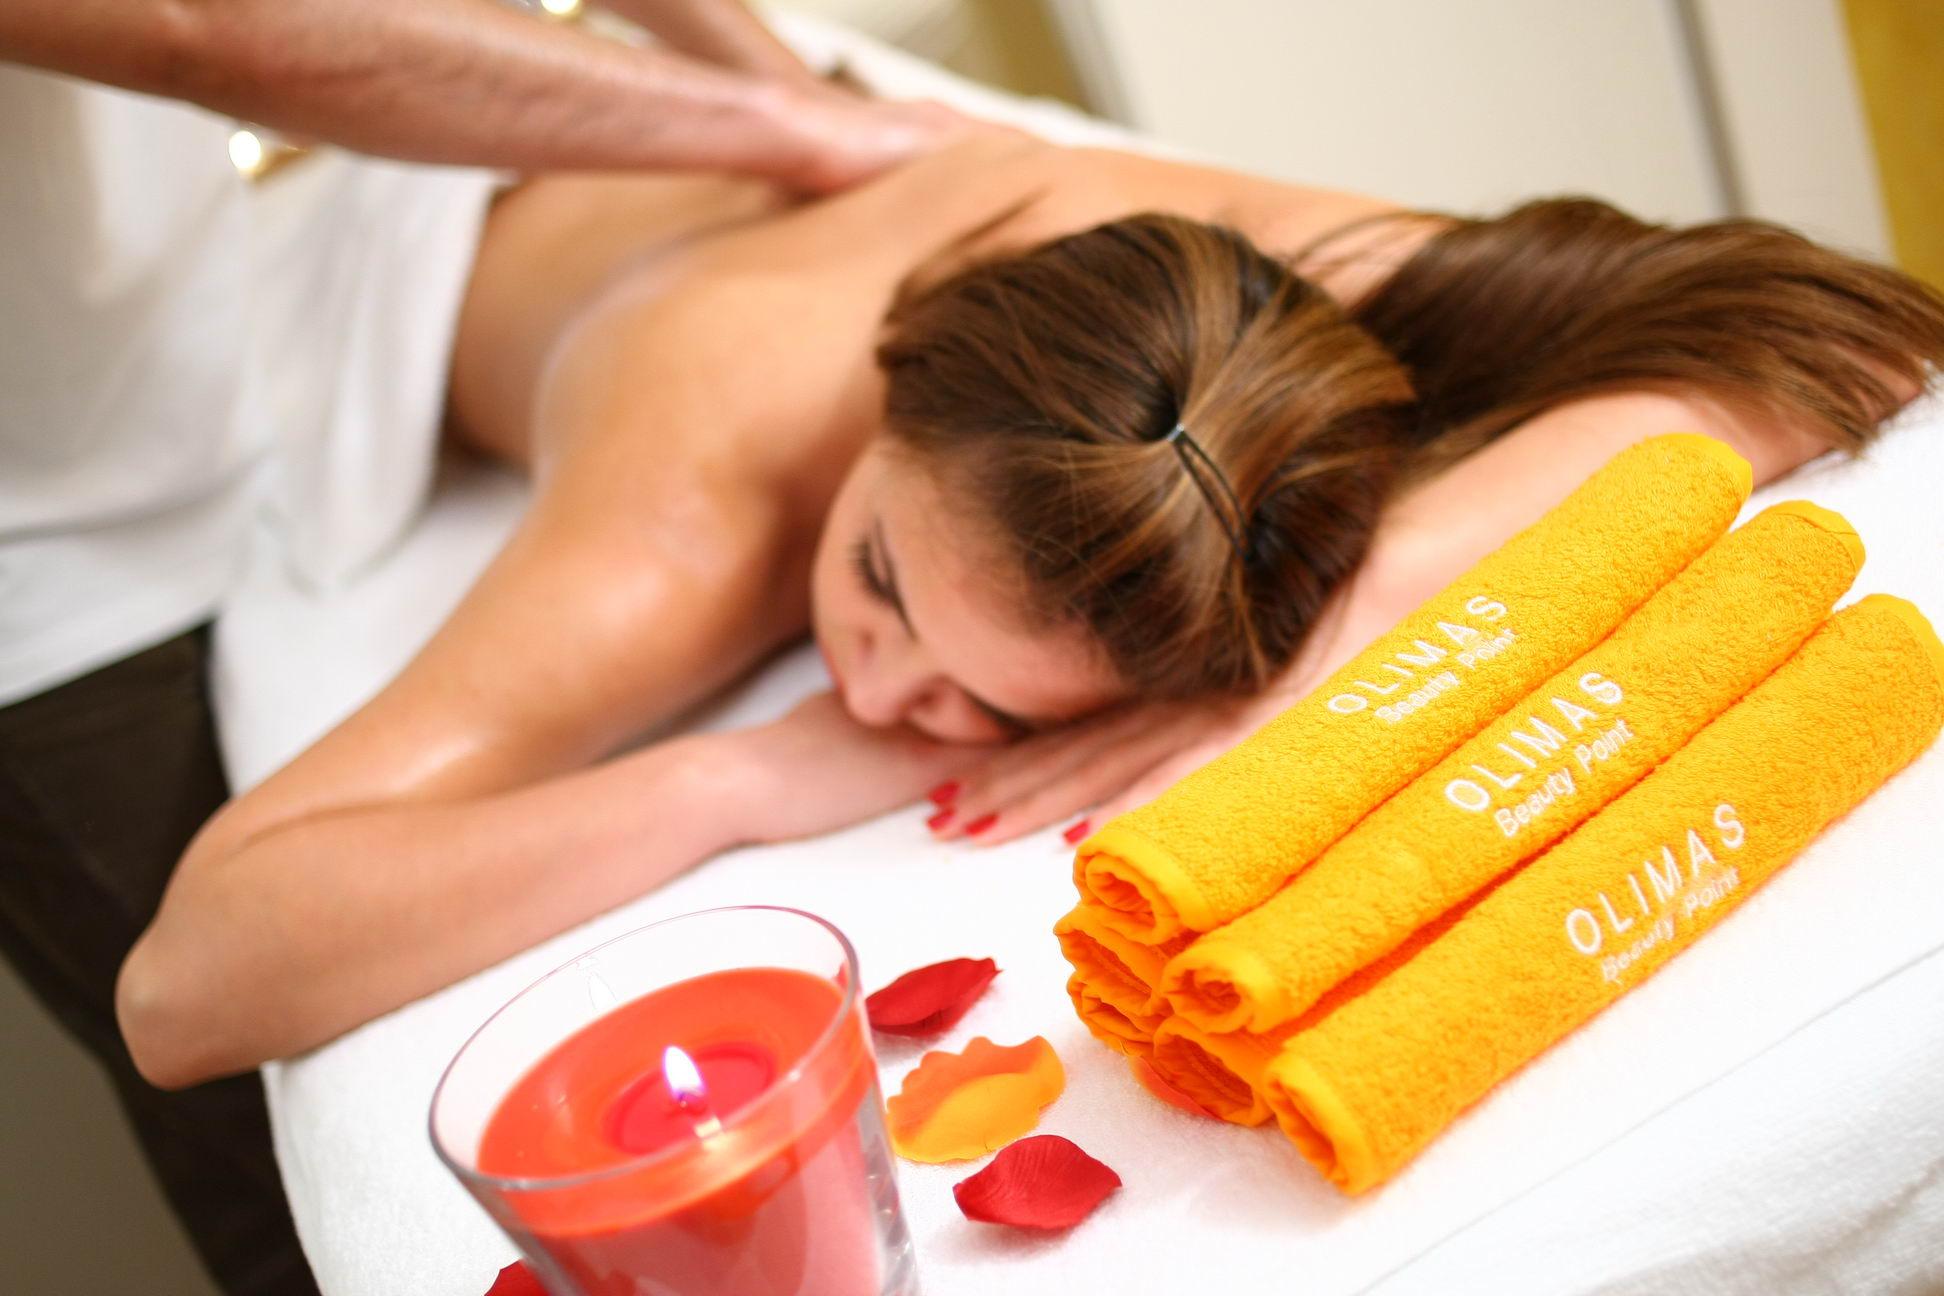 Olimas Beauty Point International - Prefessional Massage Center